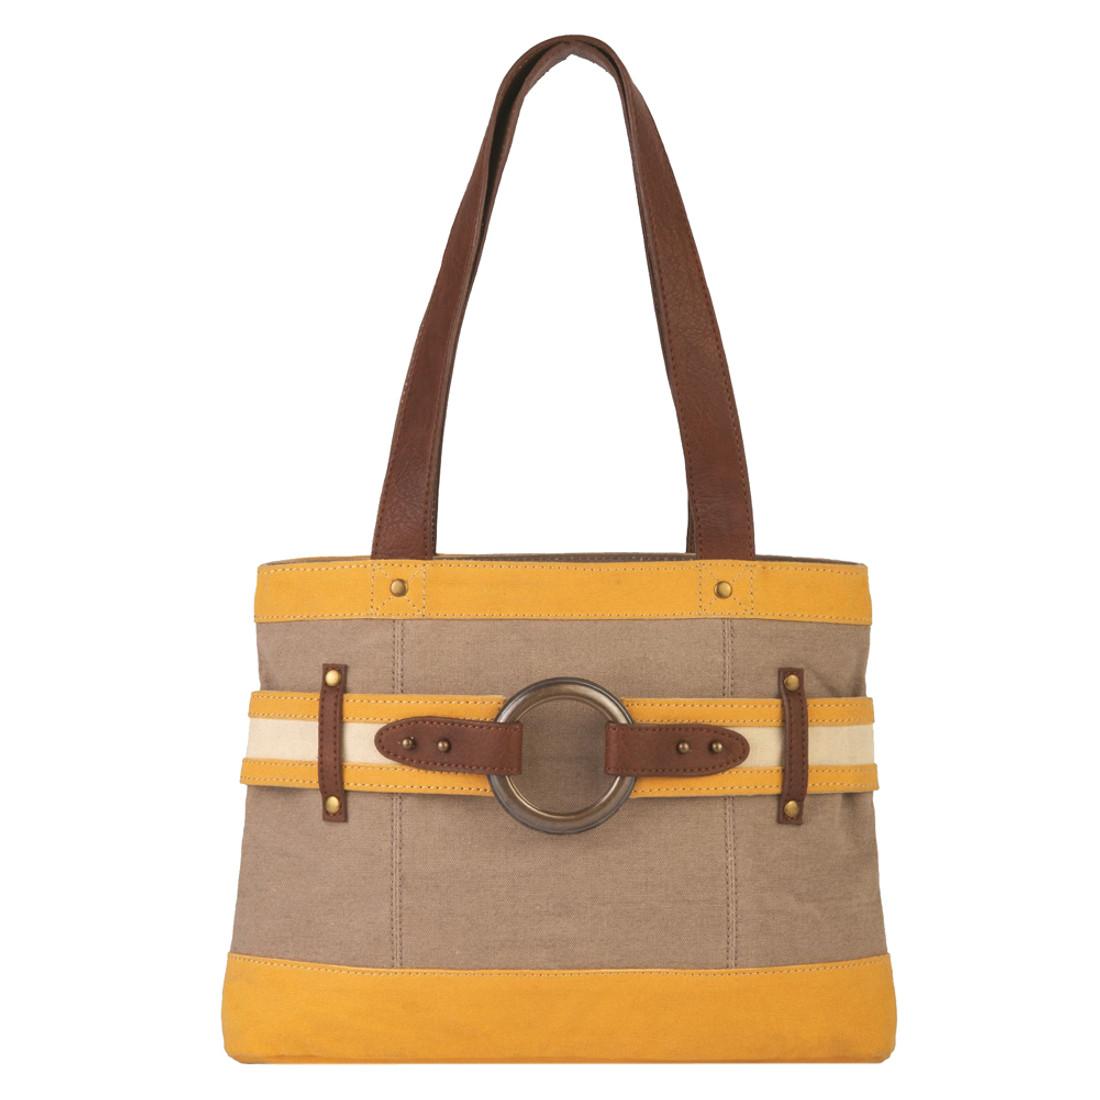 Goldenrod Rowen Canvas Handbag Purse